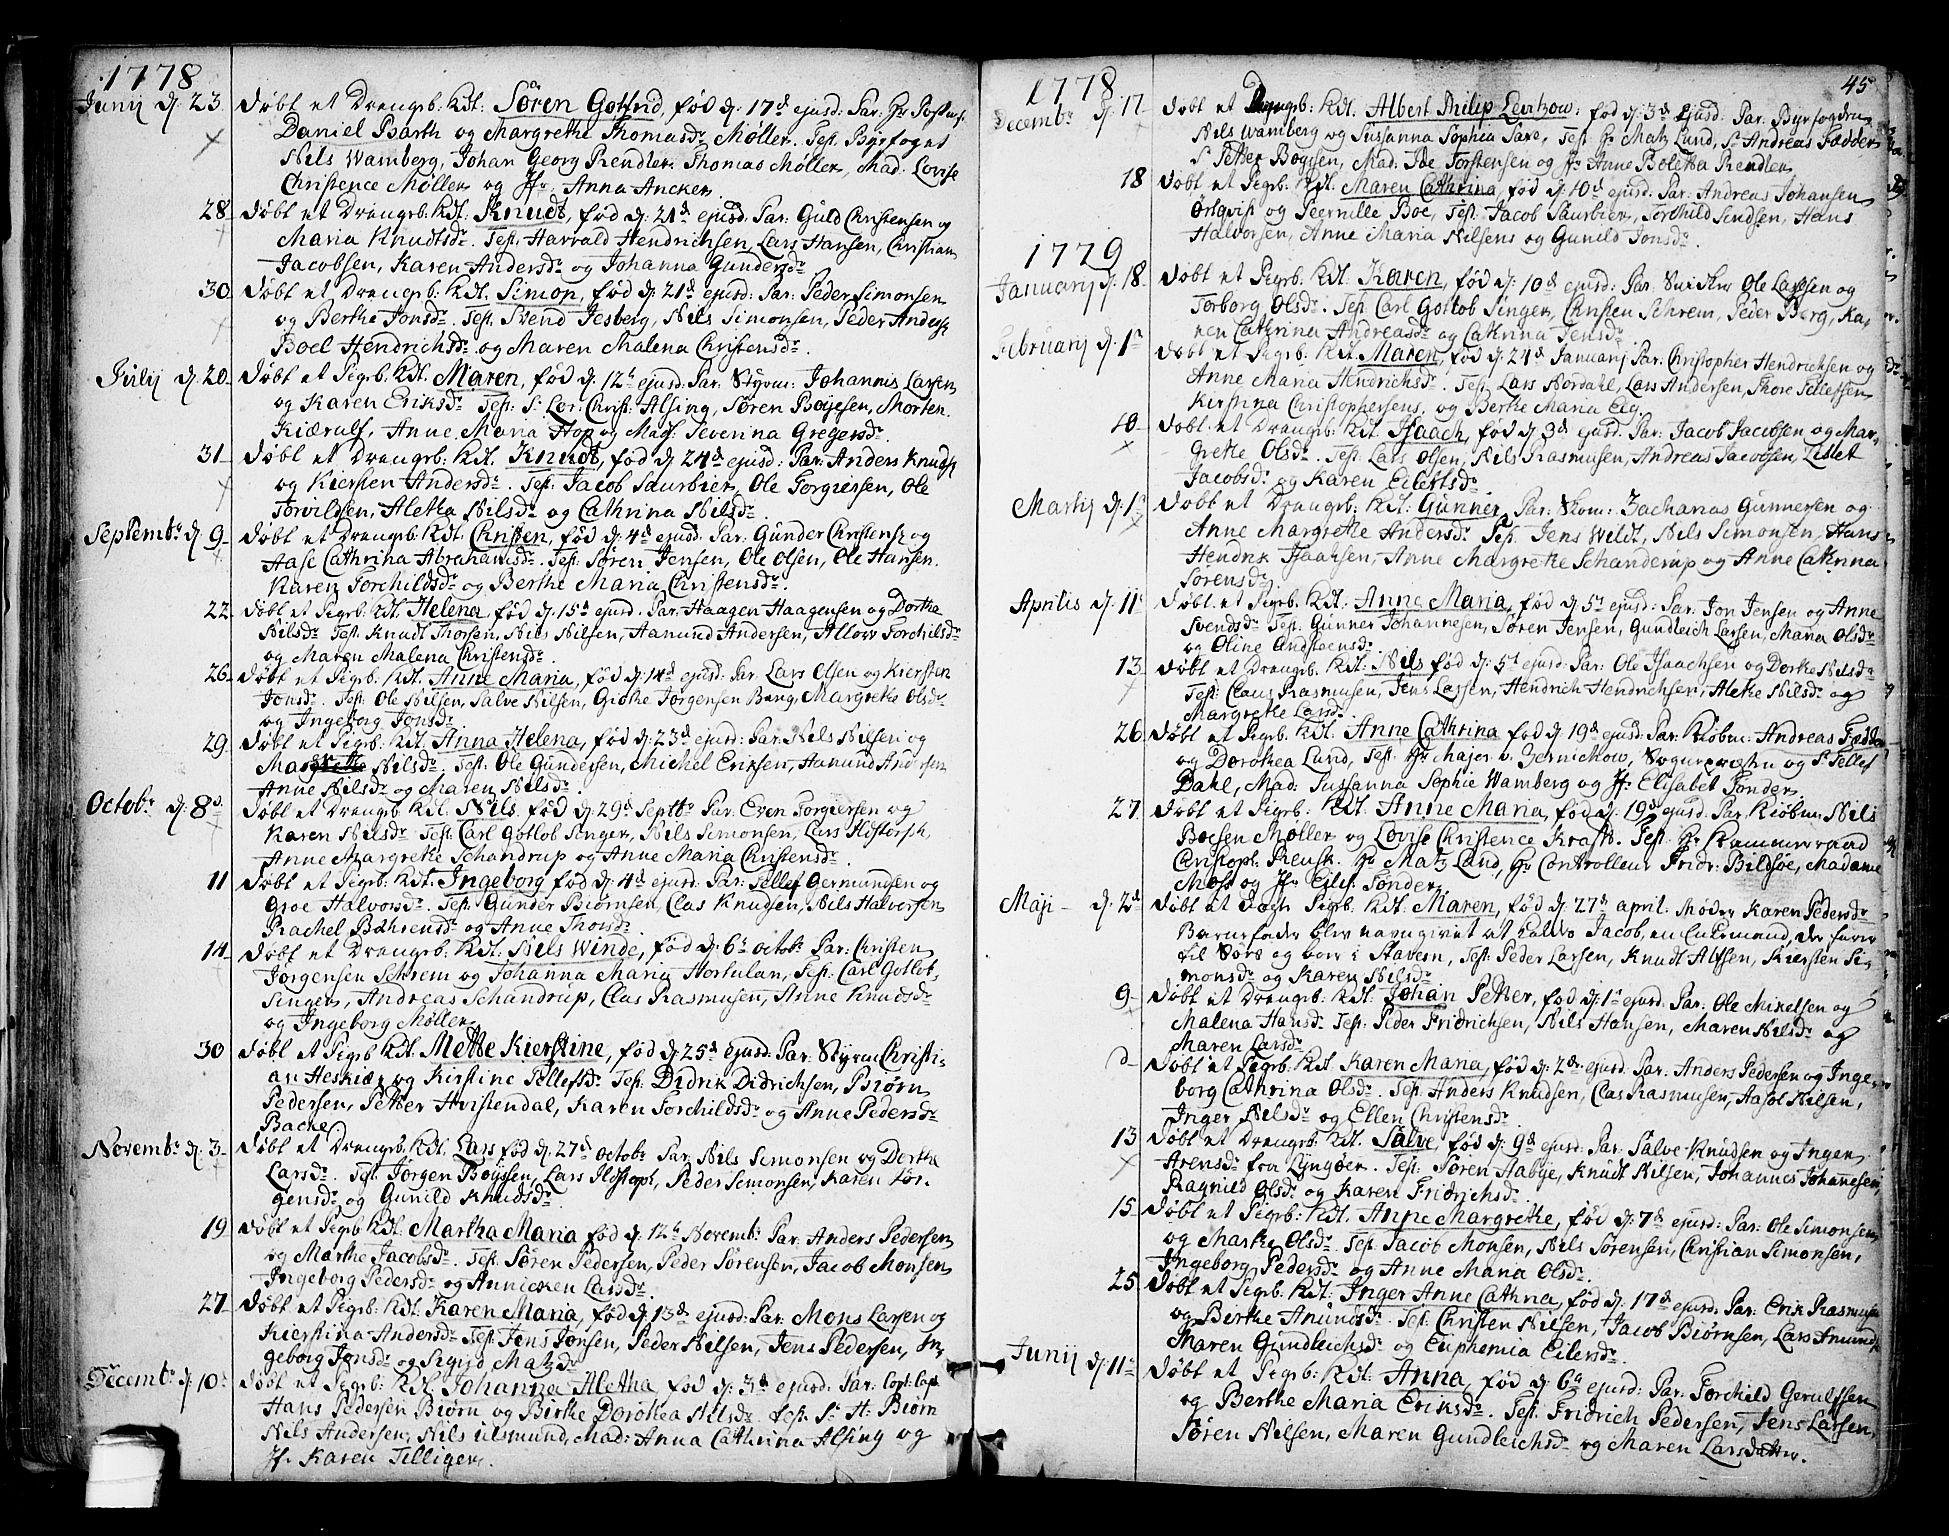 SAKO, Kragerø kirkebøker, F/Fa/L0002: Ministerialbok nr. 2, 1767-1802, s. 45